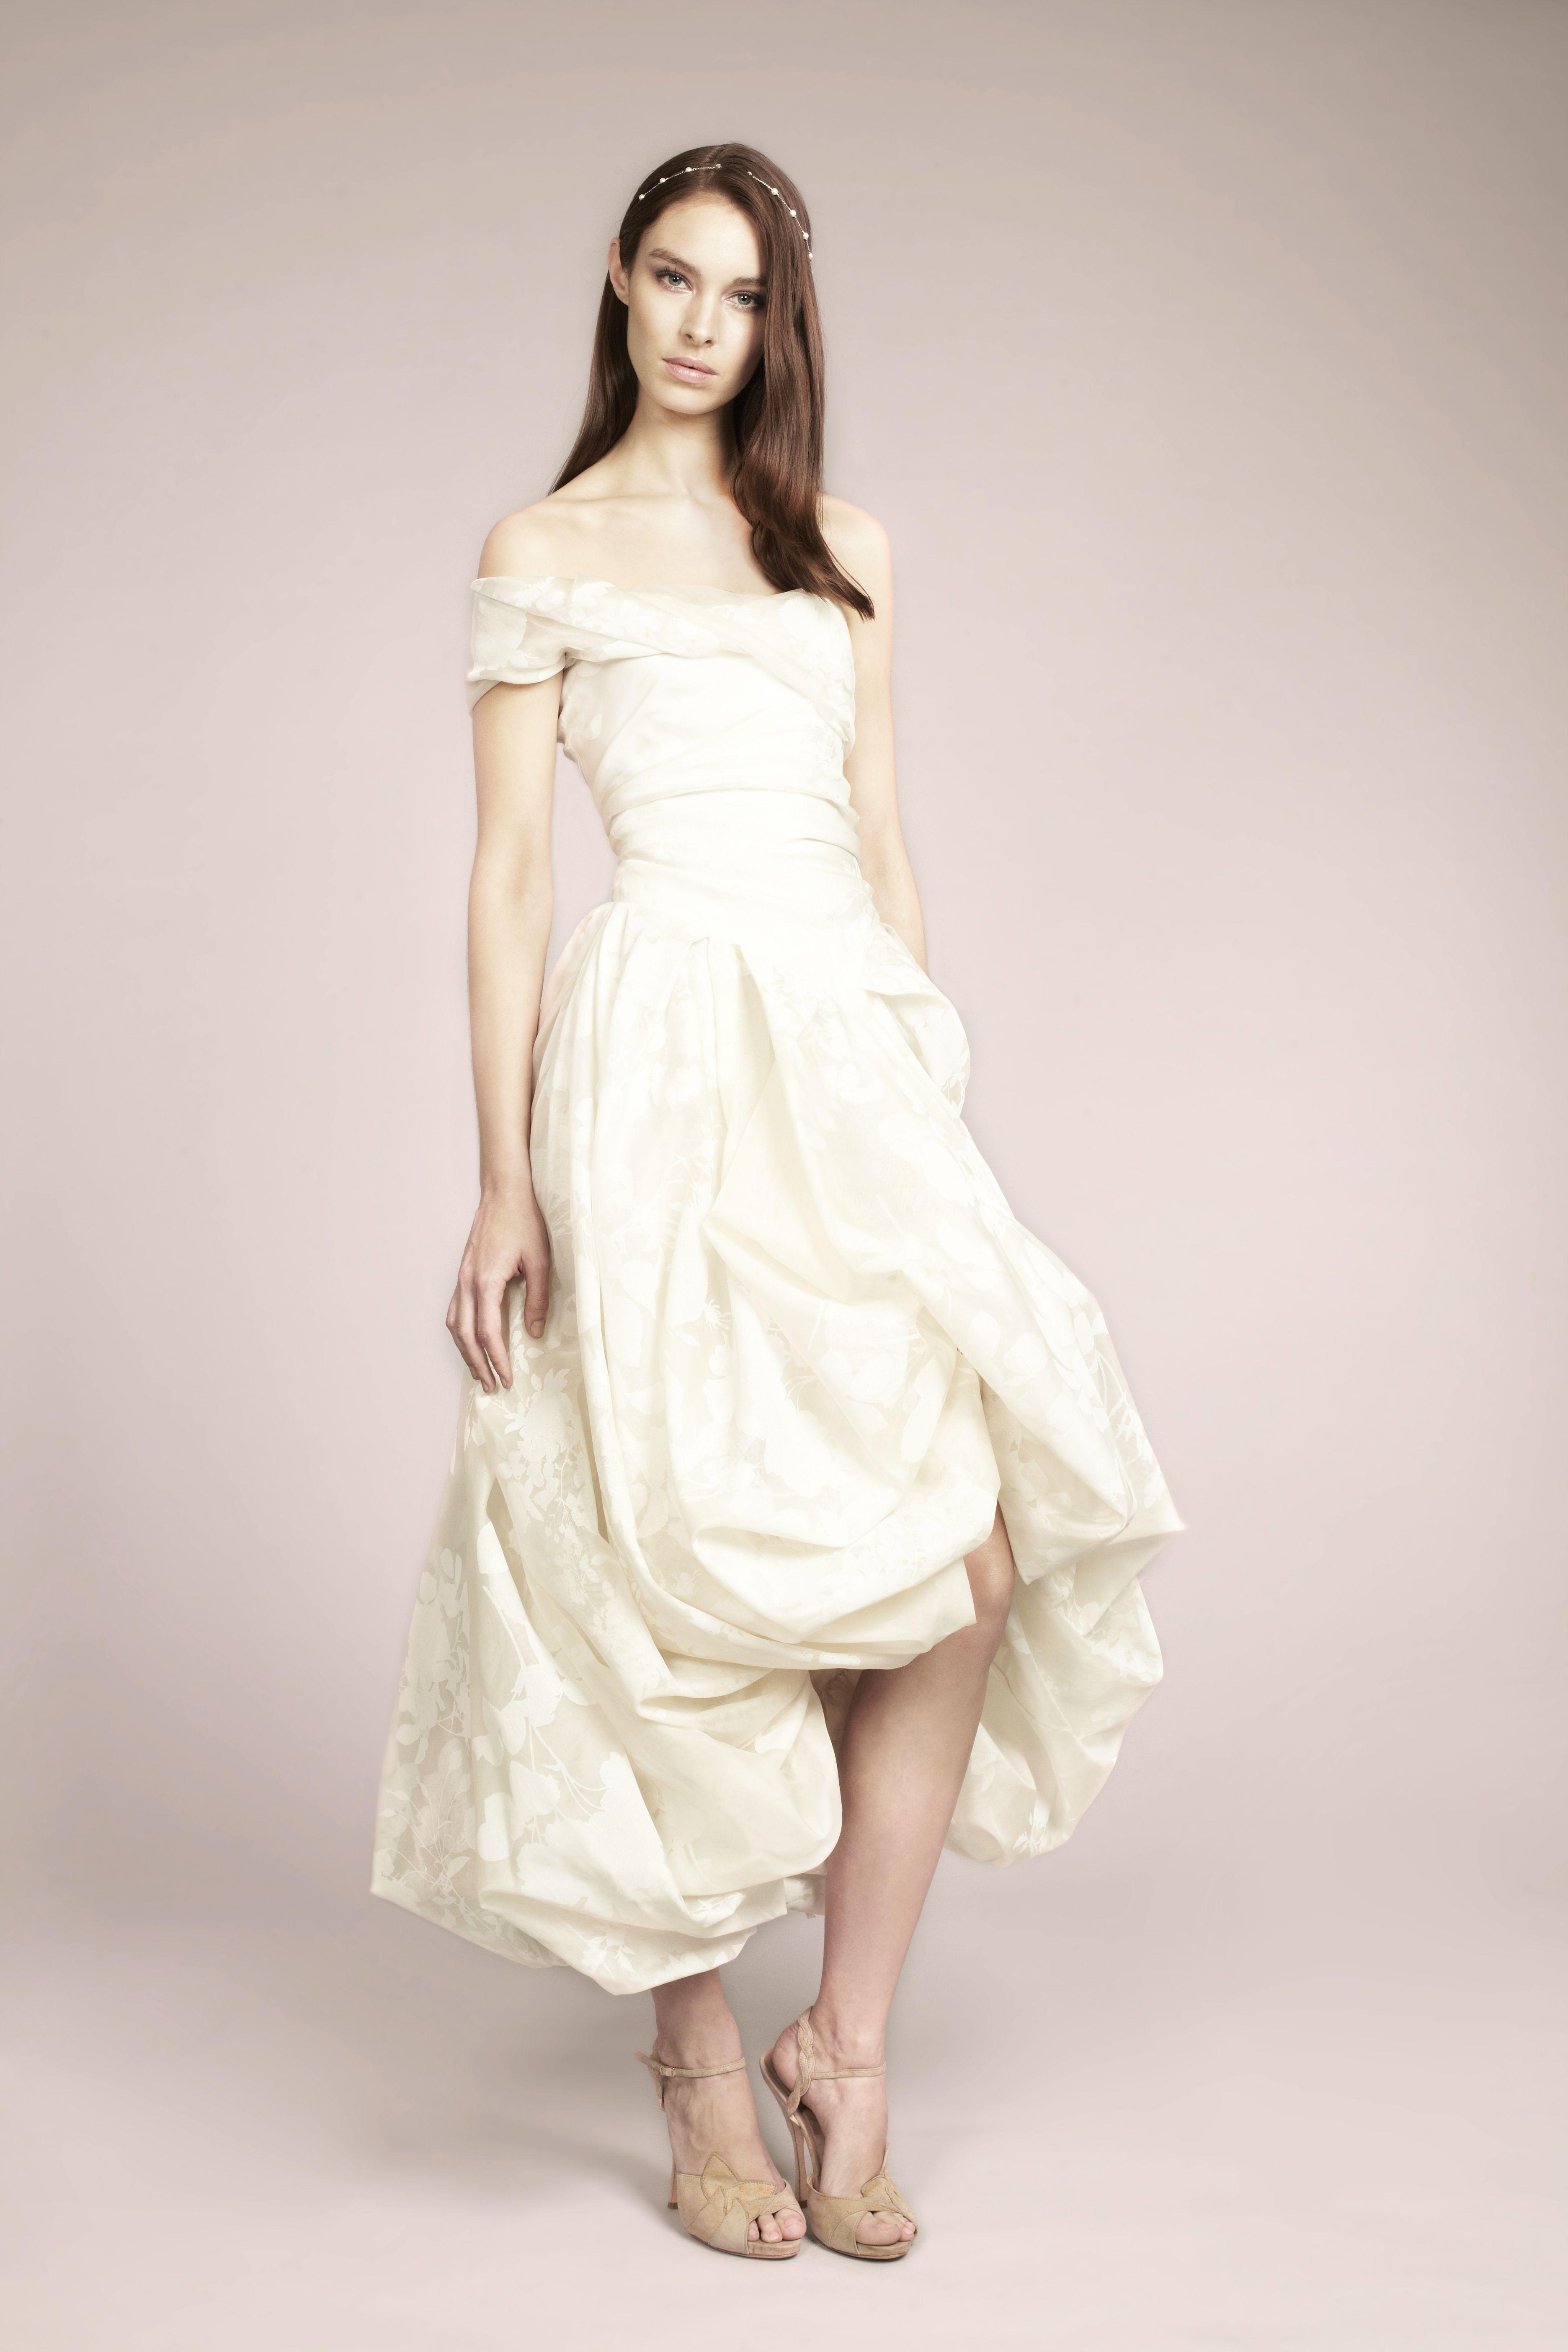 Vivienne westwood wedding dress  Shop  Bridal GownHighLow  Pinterest  Vivienne westwood